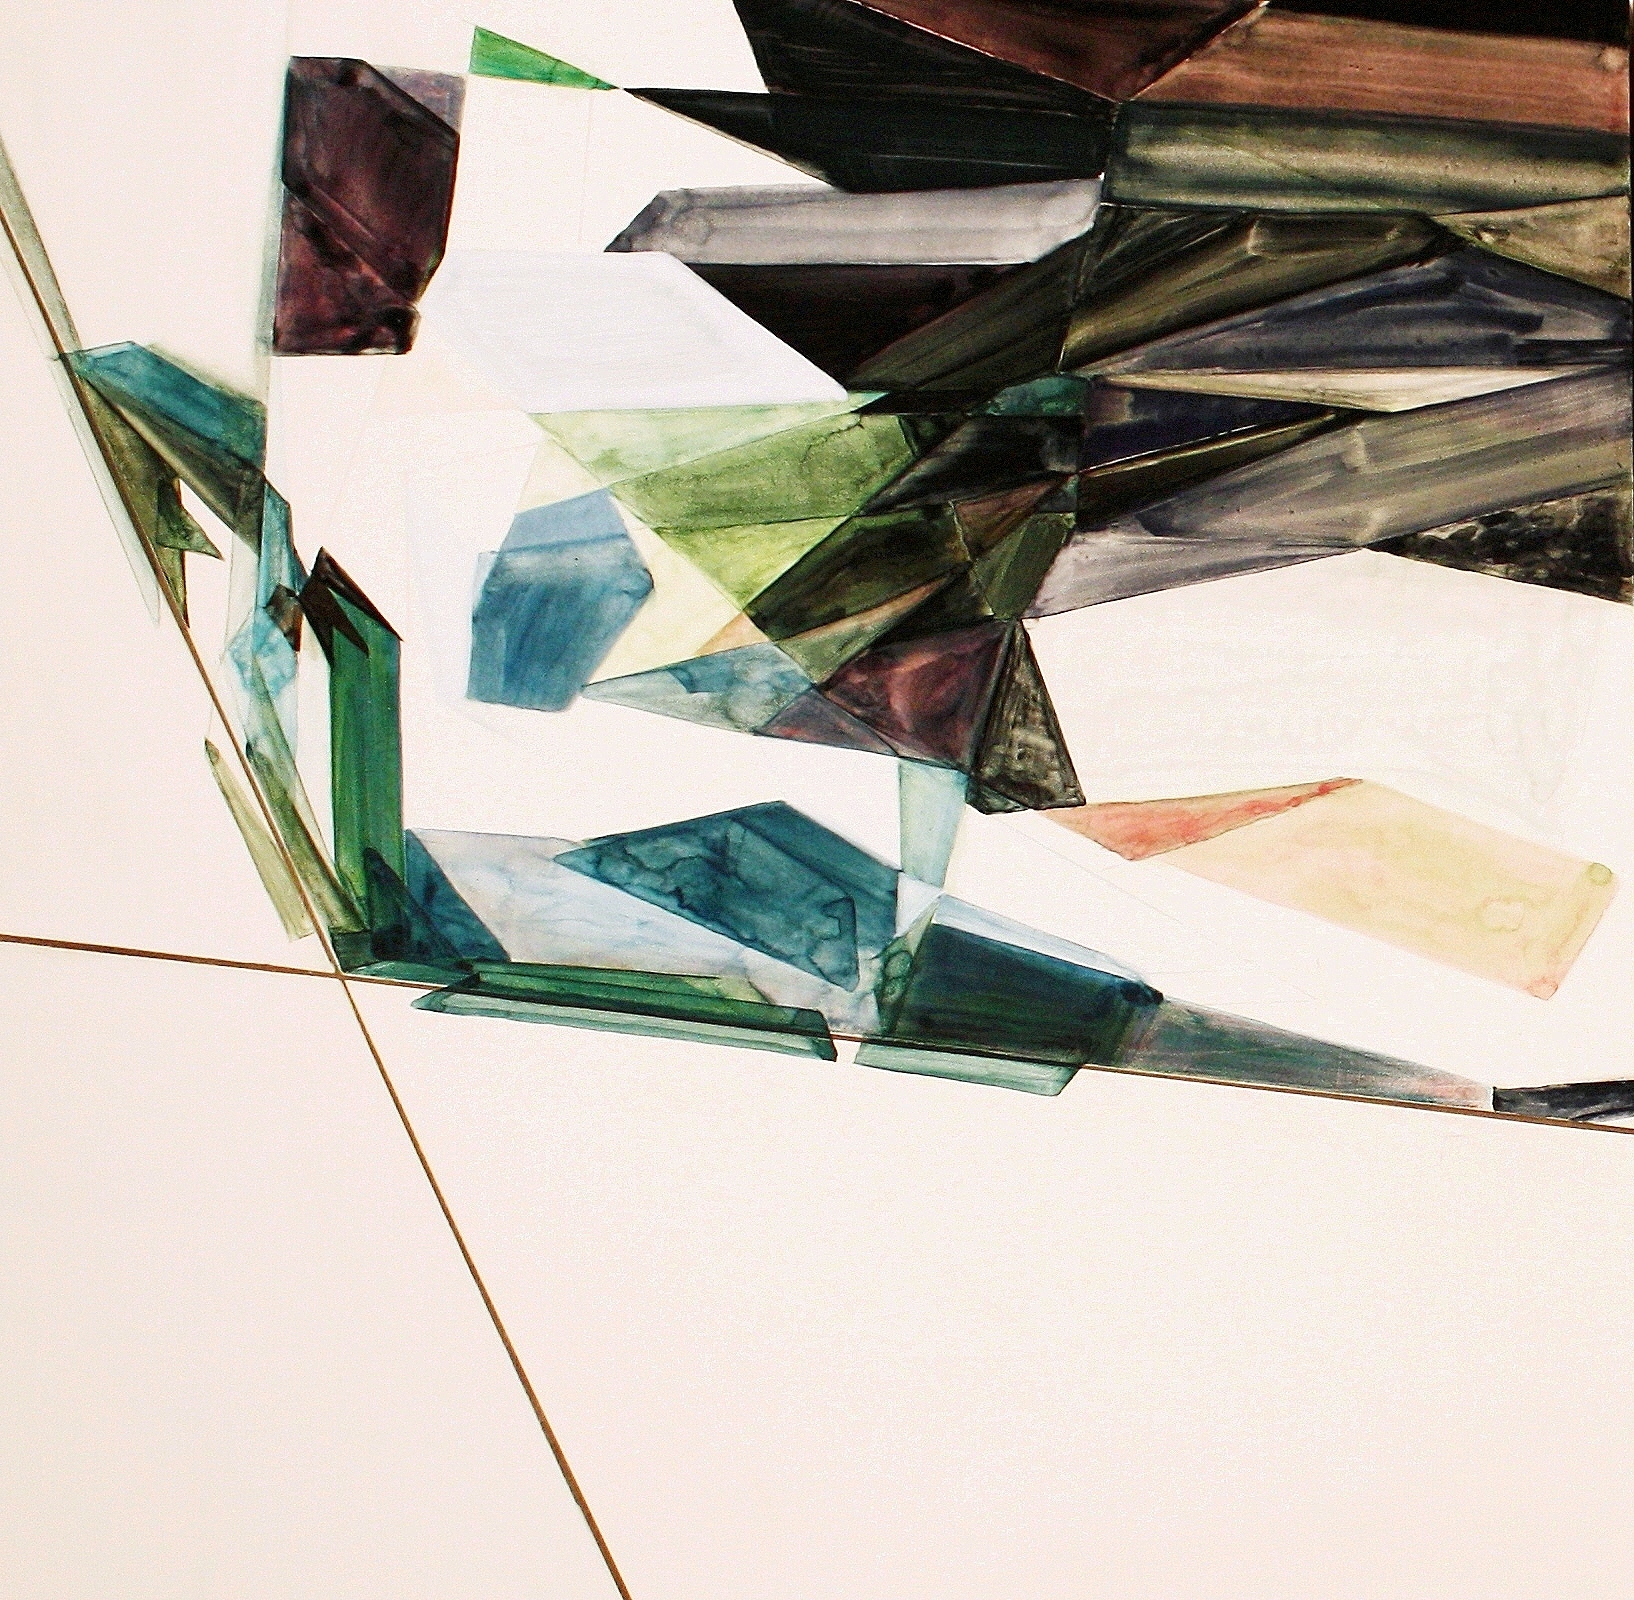 Untitled (cerulean), 2012